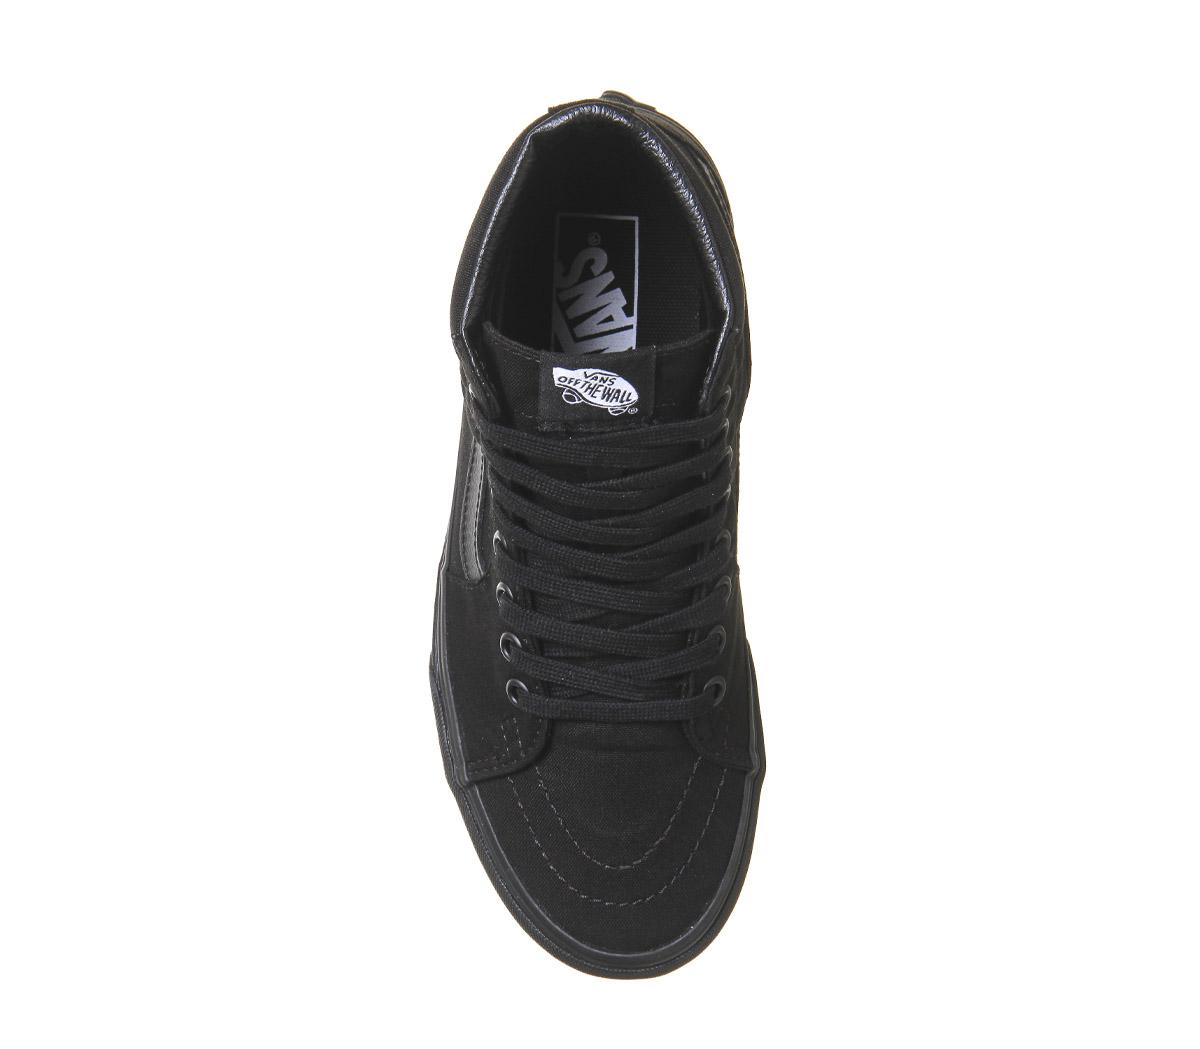 cc06c2bc919 Womens-Vans-Sk8-Hi-Black-Mono-Trainers-Shoes thumbnail